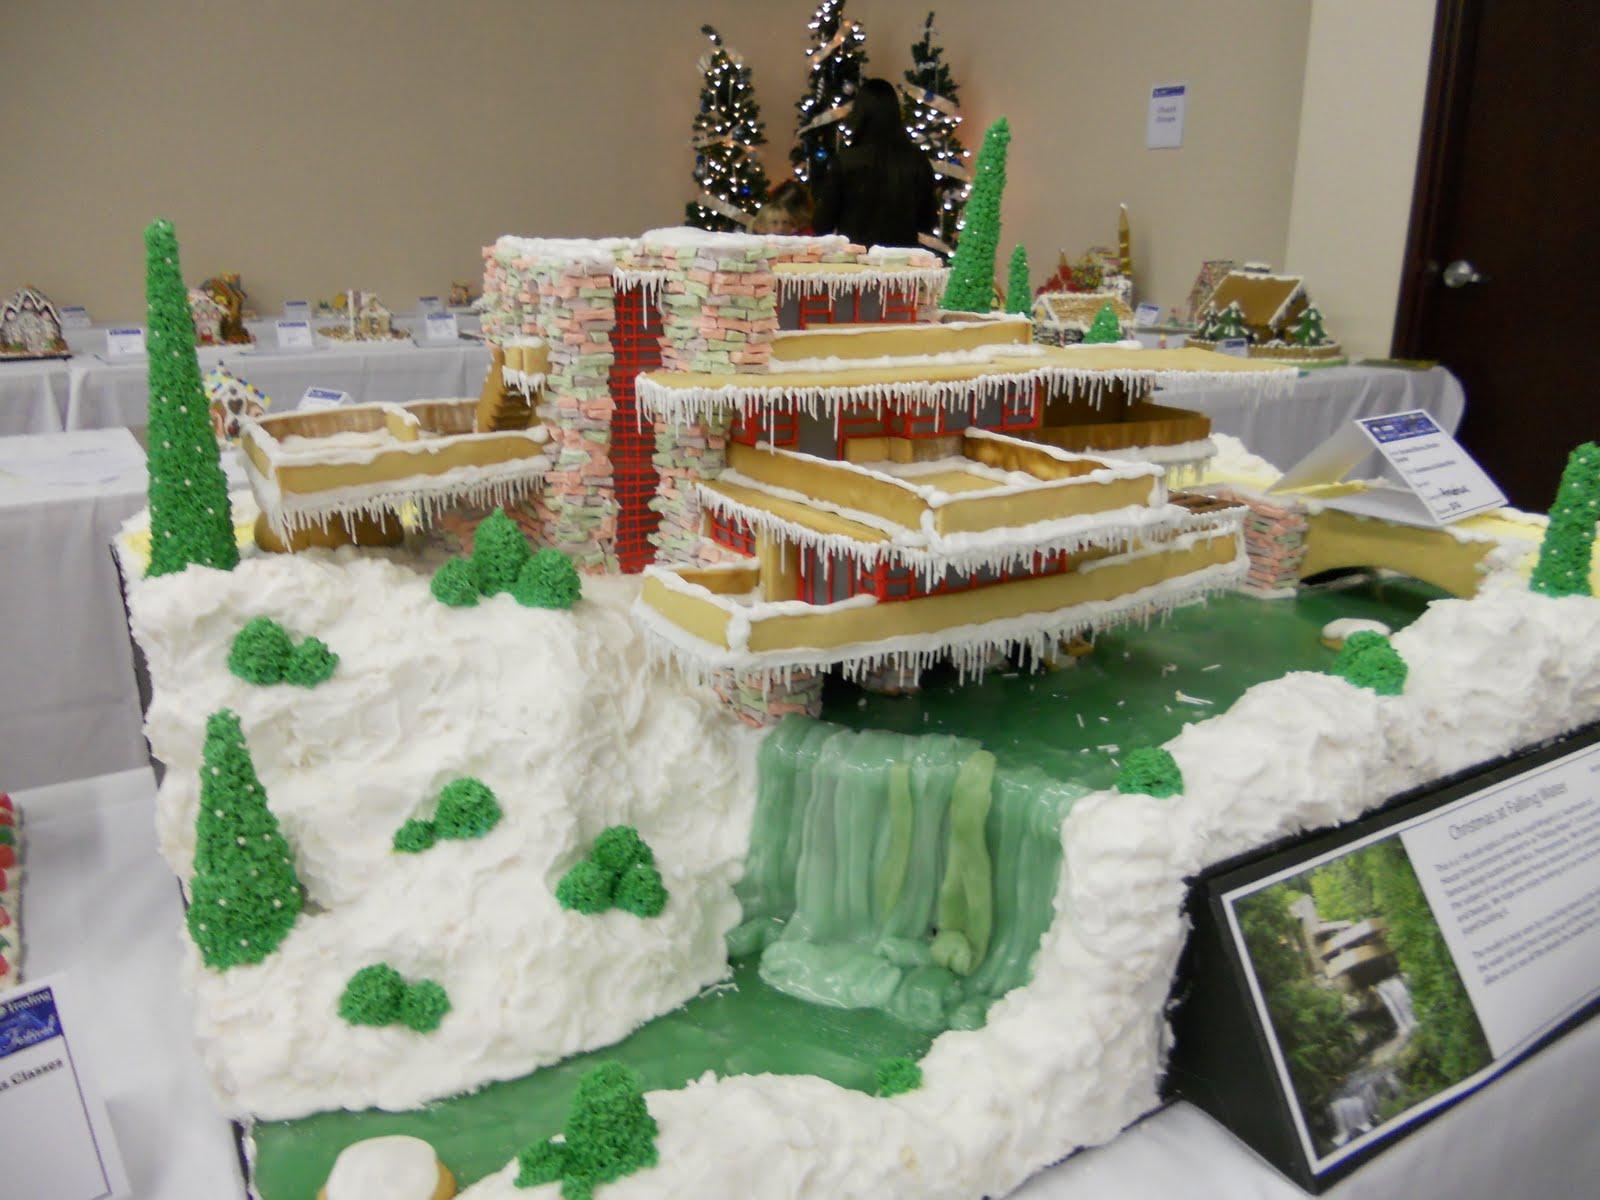 Water Slide Cake Decorating